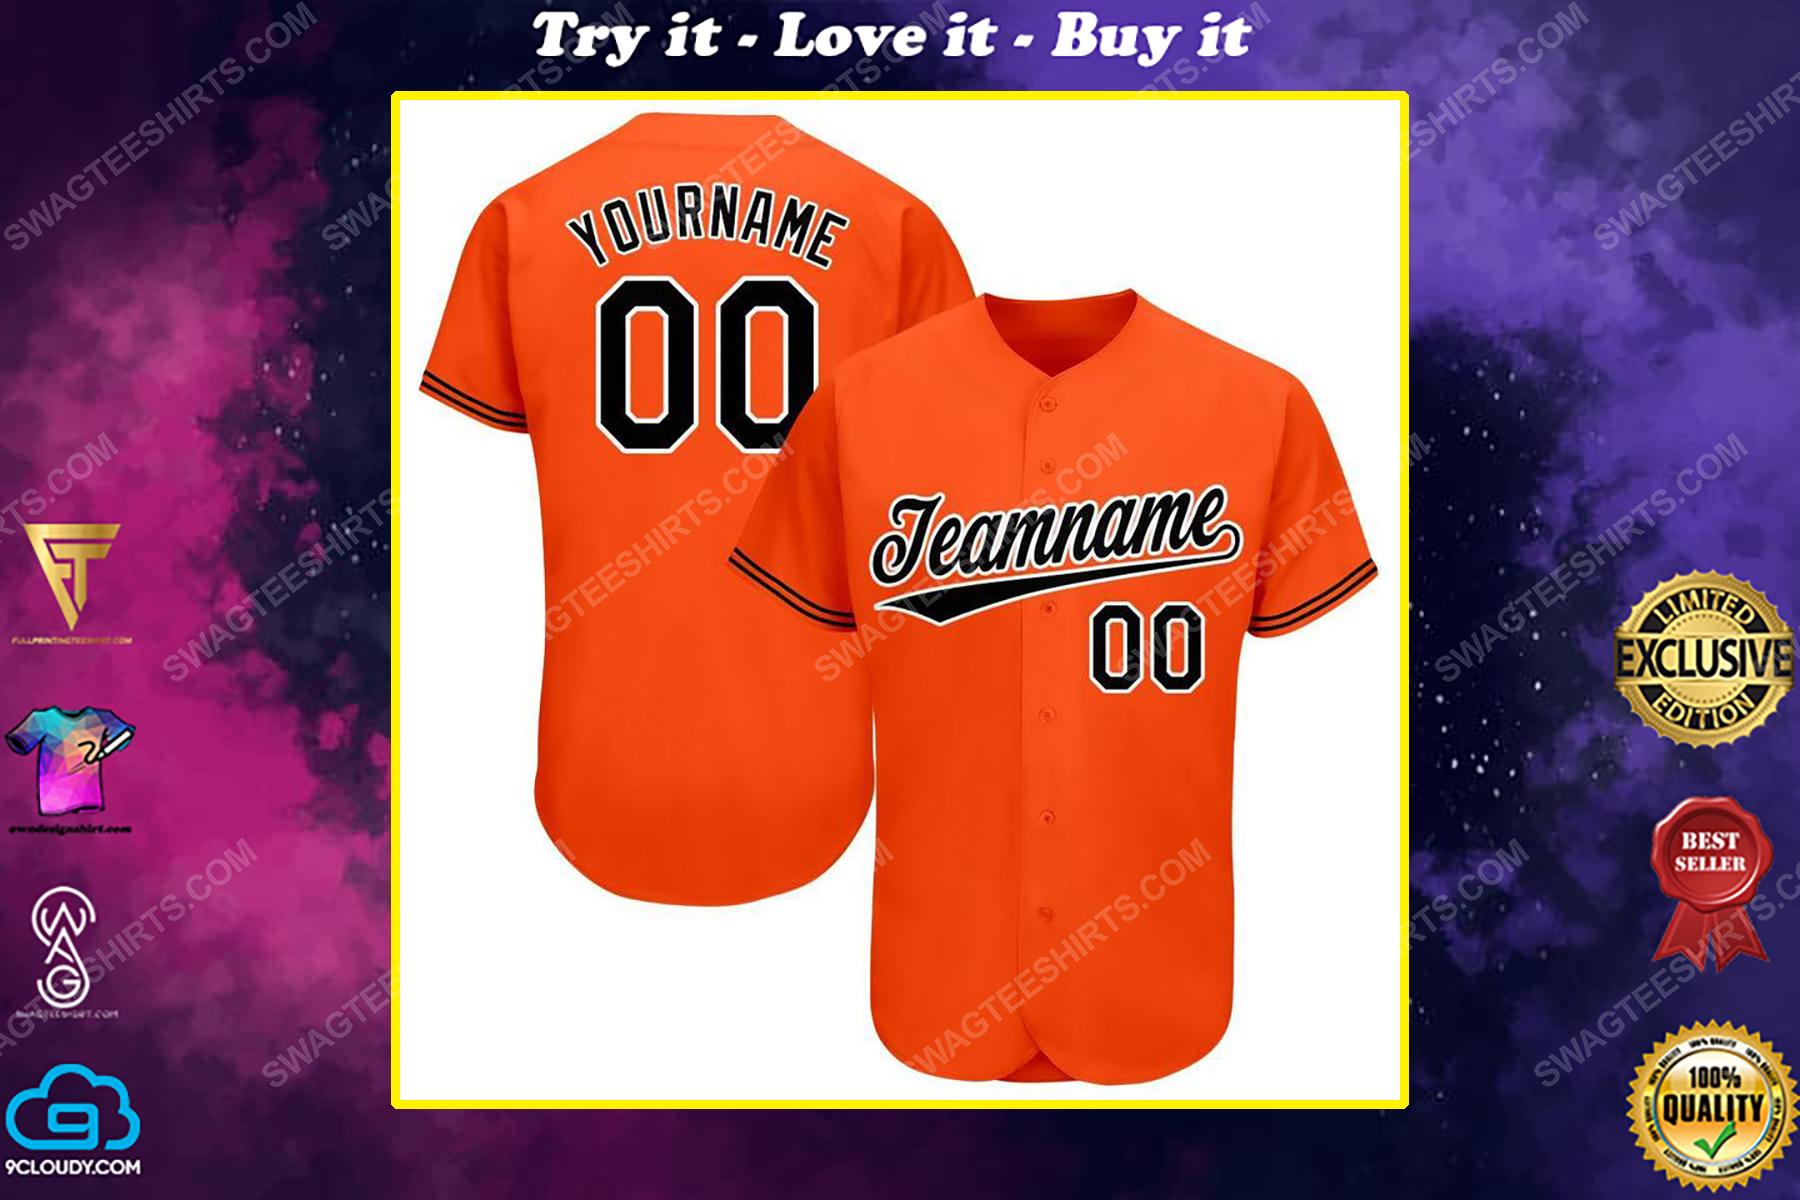 Custom team name baltimore orioles major league baseball baseball jersey